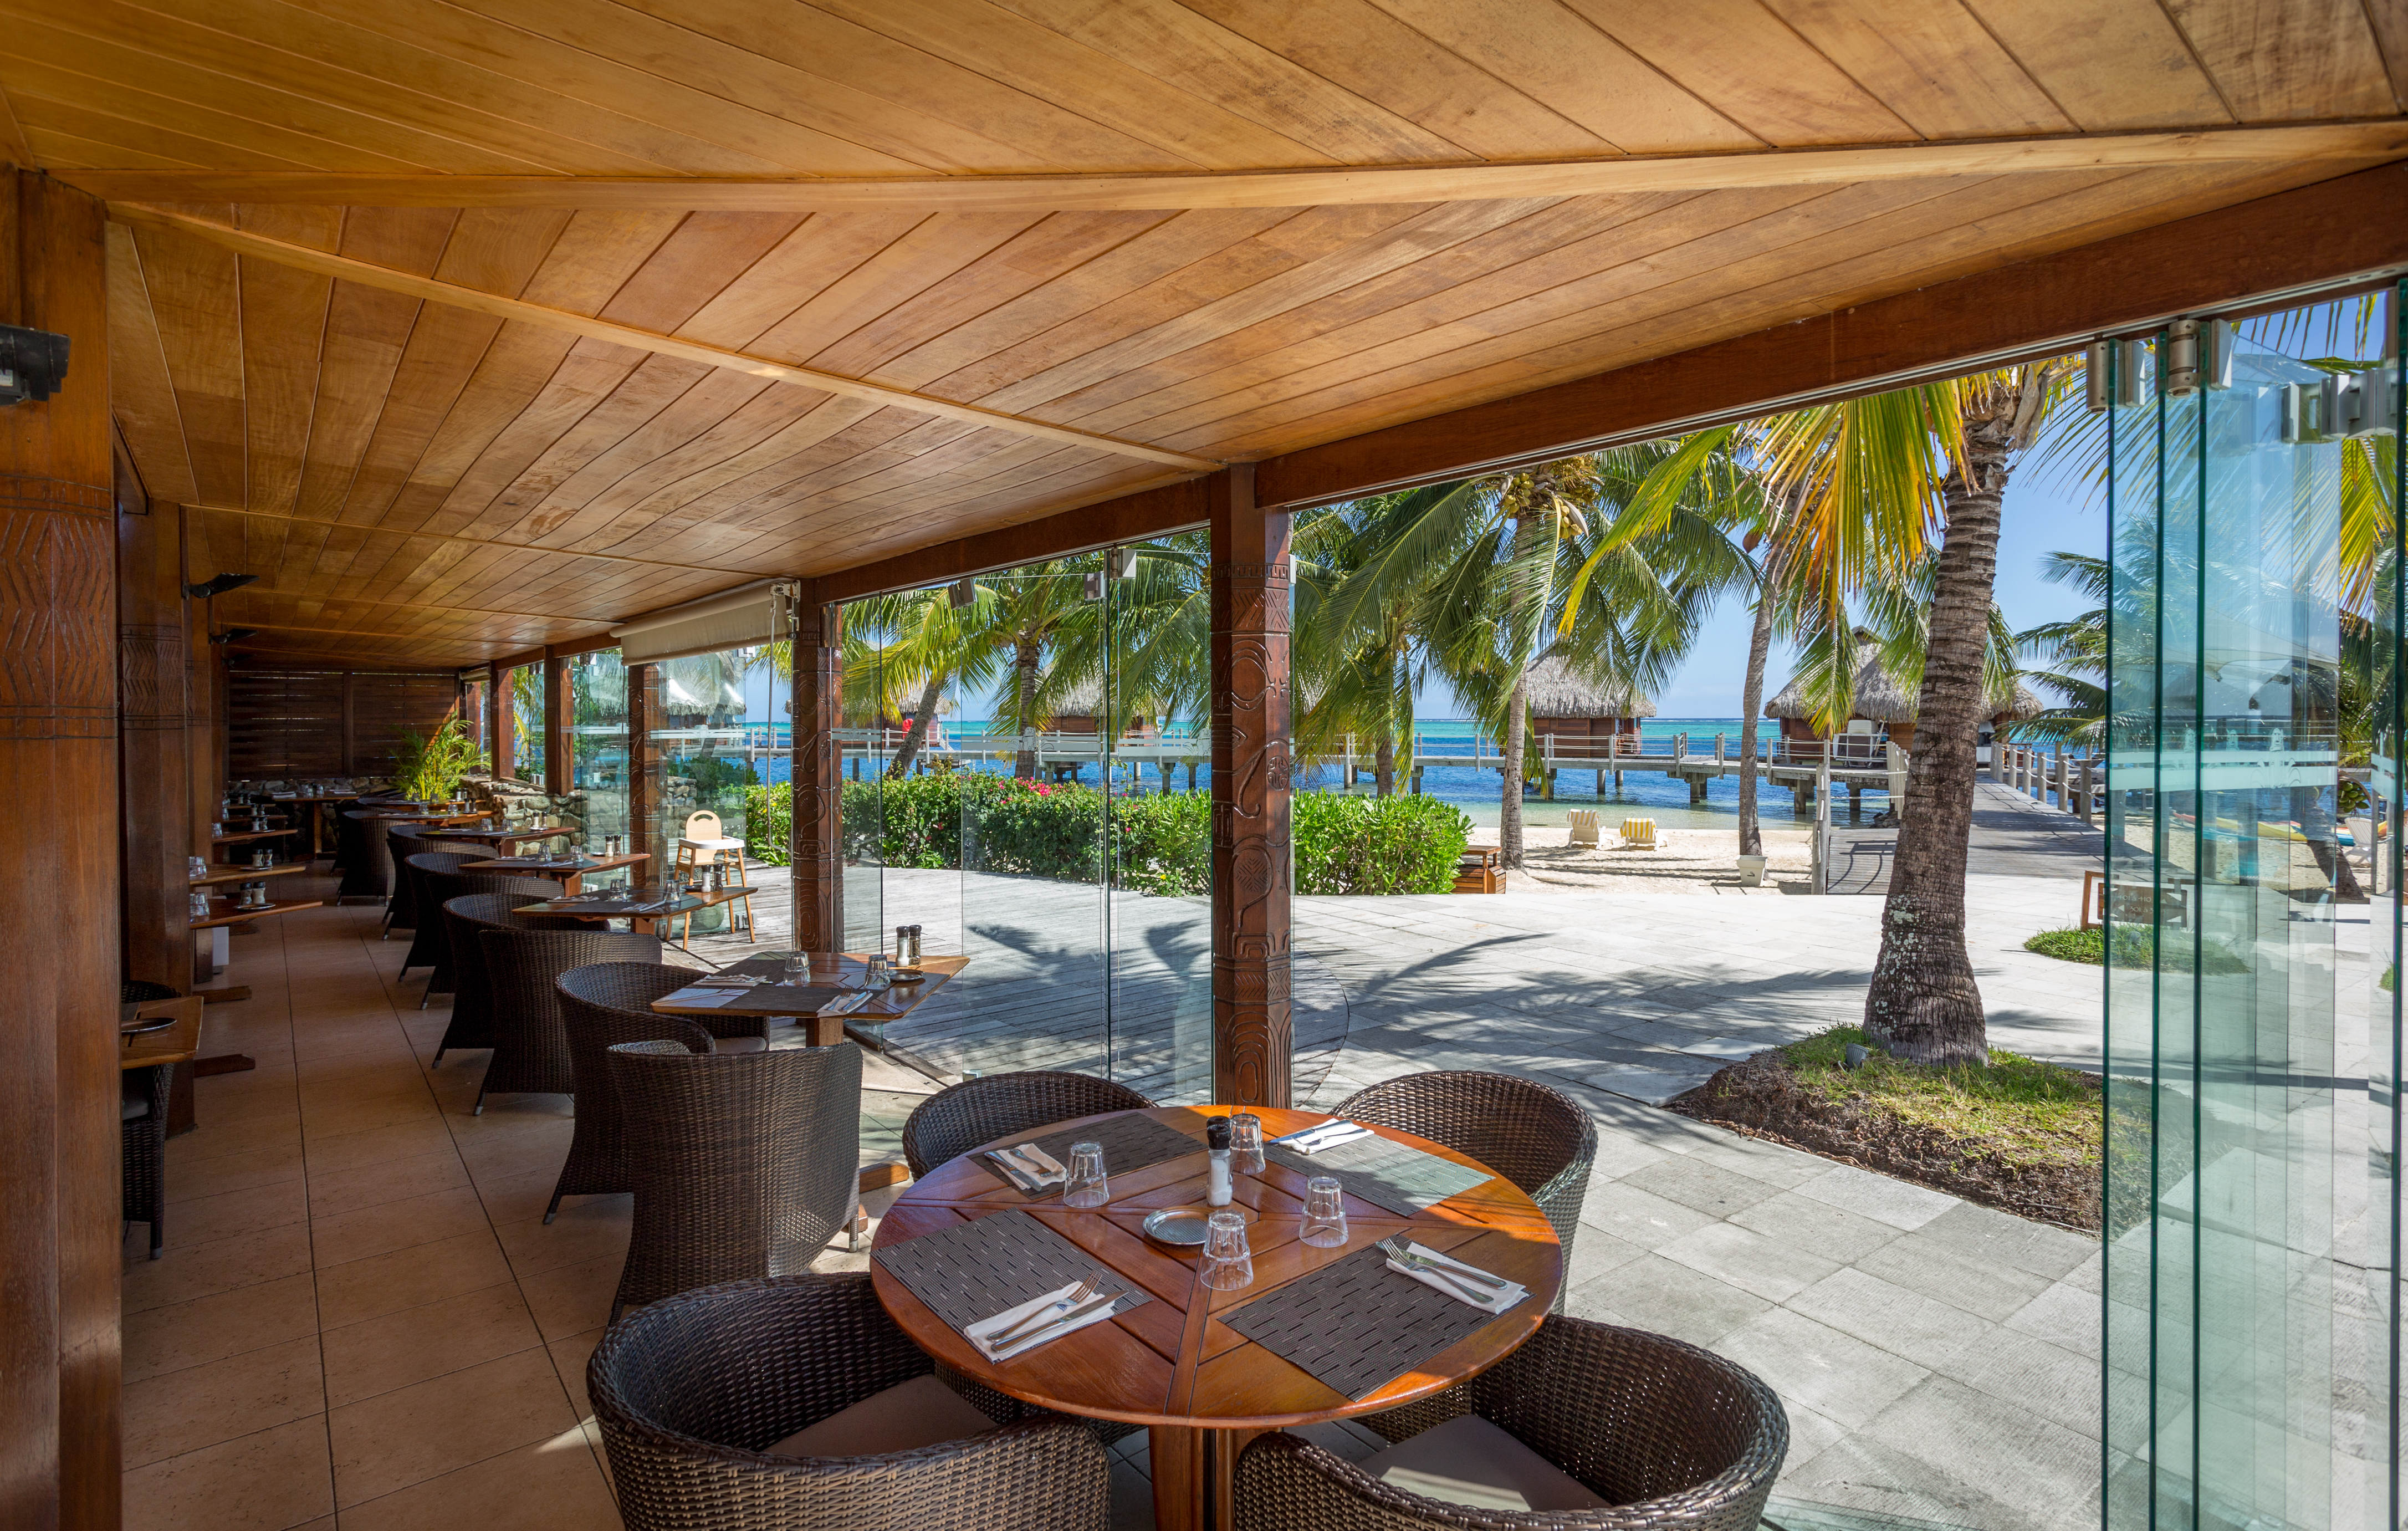 https://tahititourisme.es/wp-content/uploads/2018/03/RESTAURATION-Restaurant-Mahanai-1-Charles_Veronese.jpg